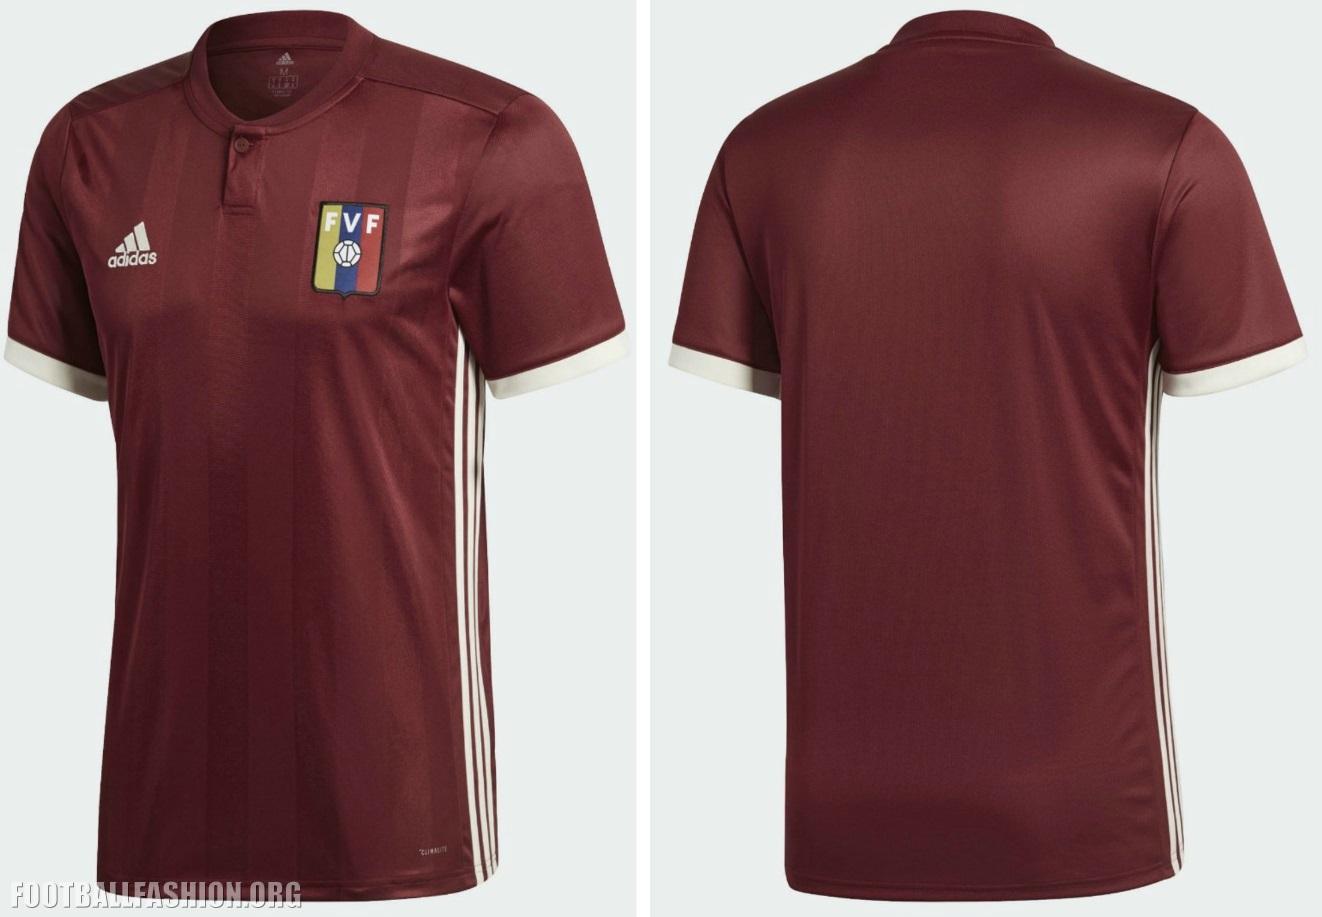 Venezuela adidas soccer jersey football kit shirt camiseta de futbol jpg  1322x917 Camisetas de futbol 8041616af9750